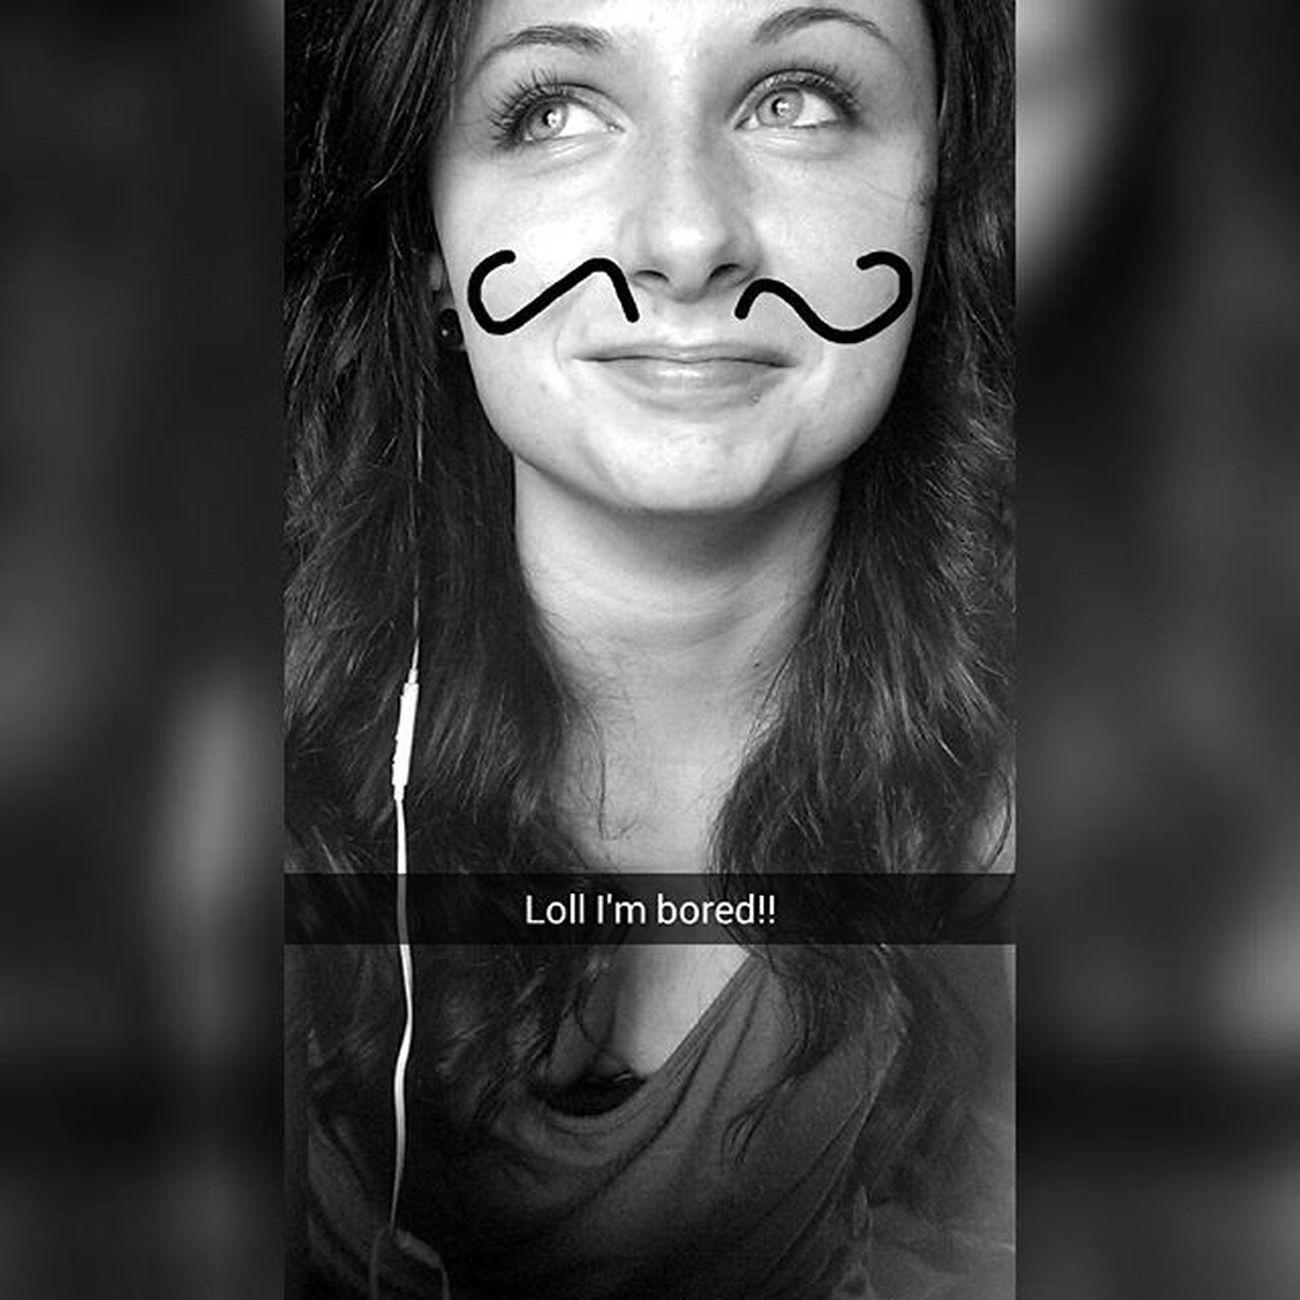 sc: girgentiaa Mustache BoredAF Imwierdlikethat Instasnapchat sc